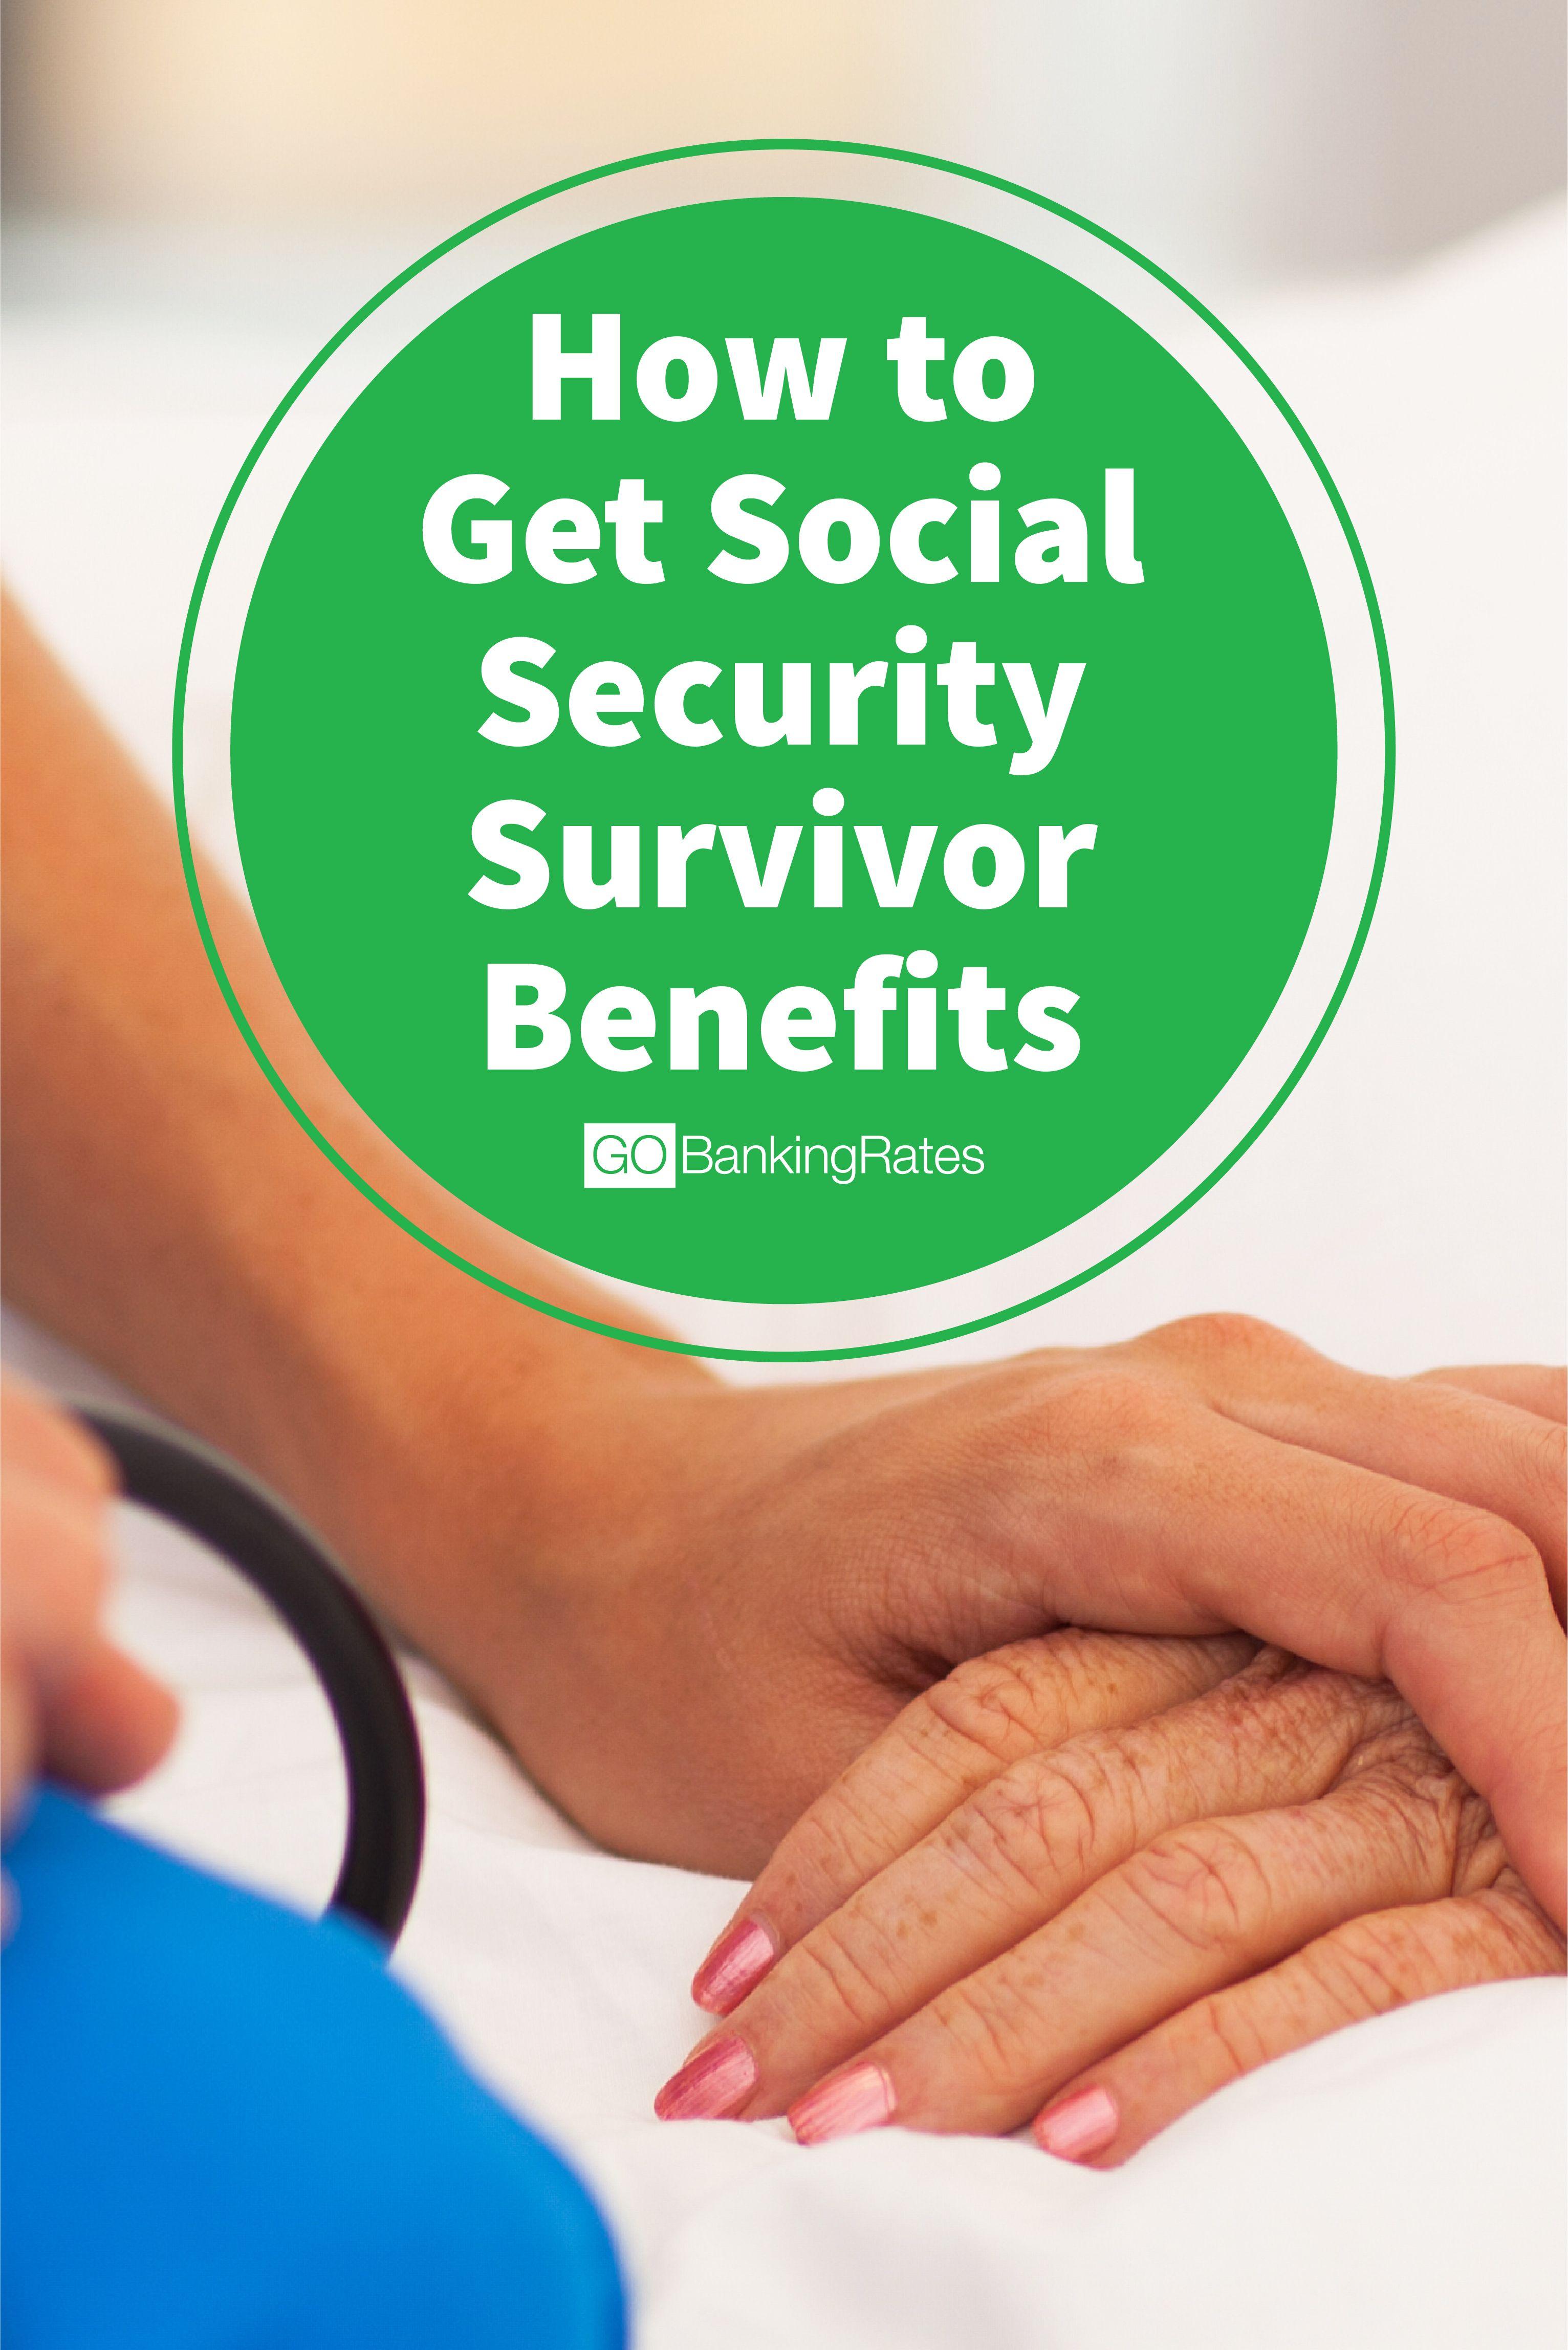 How To Get Social Security Survivor Benefits In 2021 Social Security Death Benefits Social Security Benefits Retirement Estate Planning Checklist